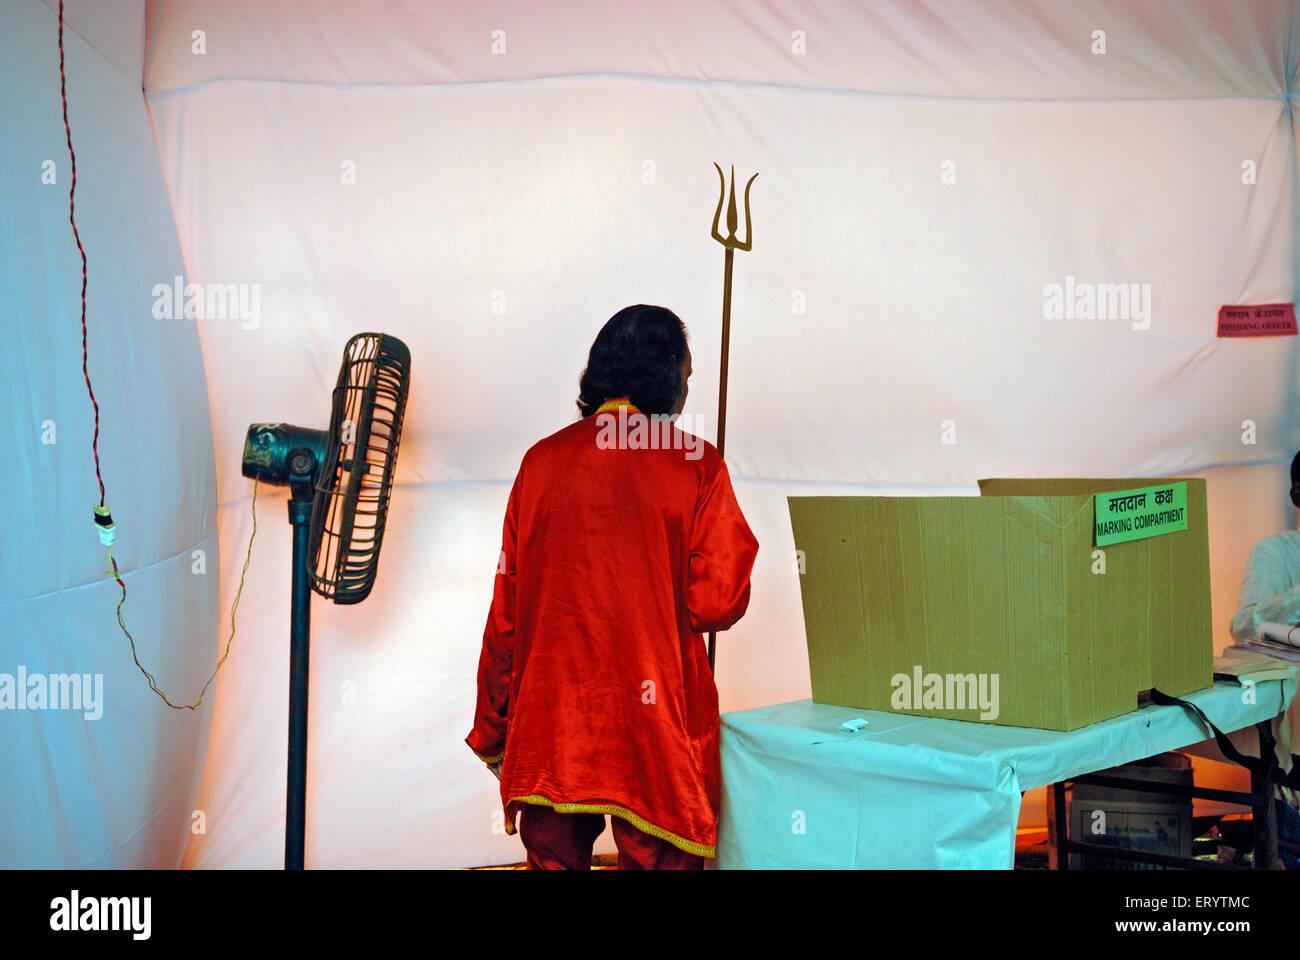 Voter carrying weapon in polling booth Bombay ; Mumbai  ; Maharashtra   ; India 13 10 2009 - Stock Image